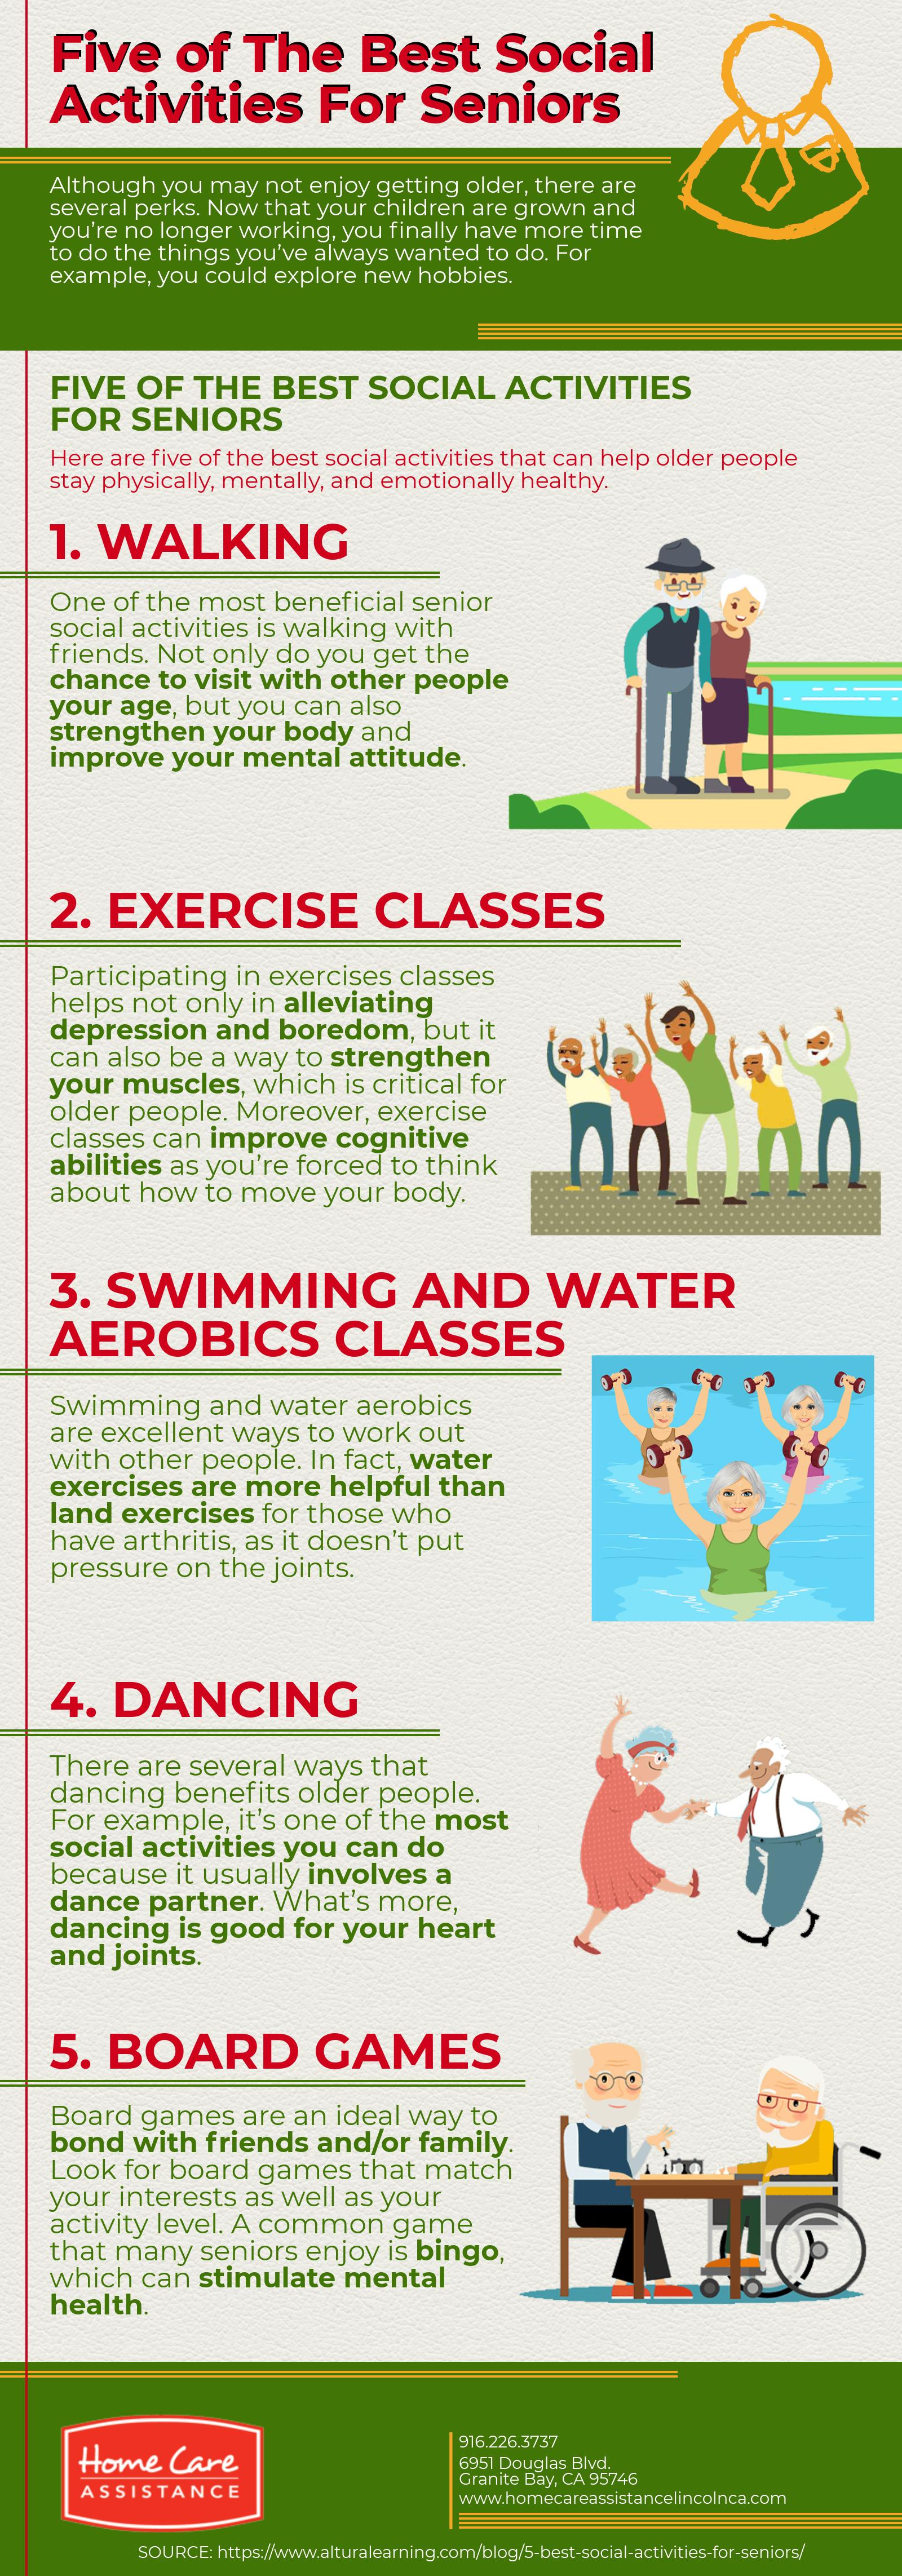 best-social-activities-for-seniors